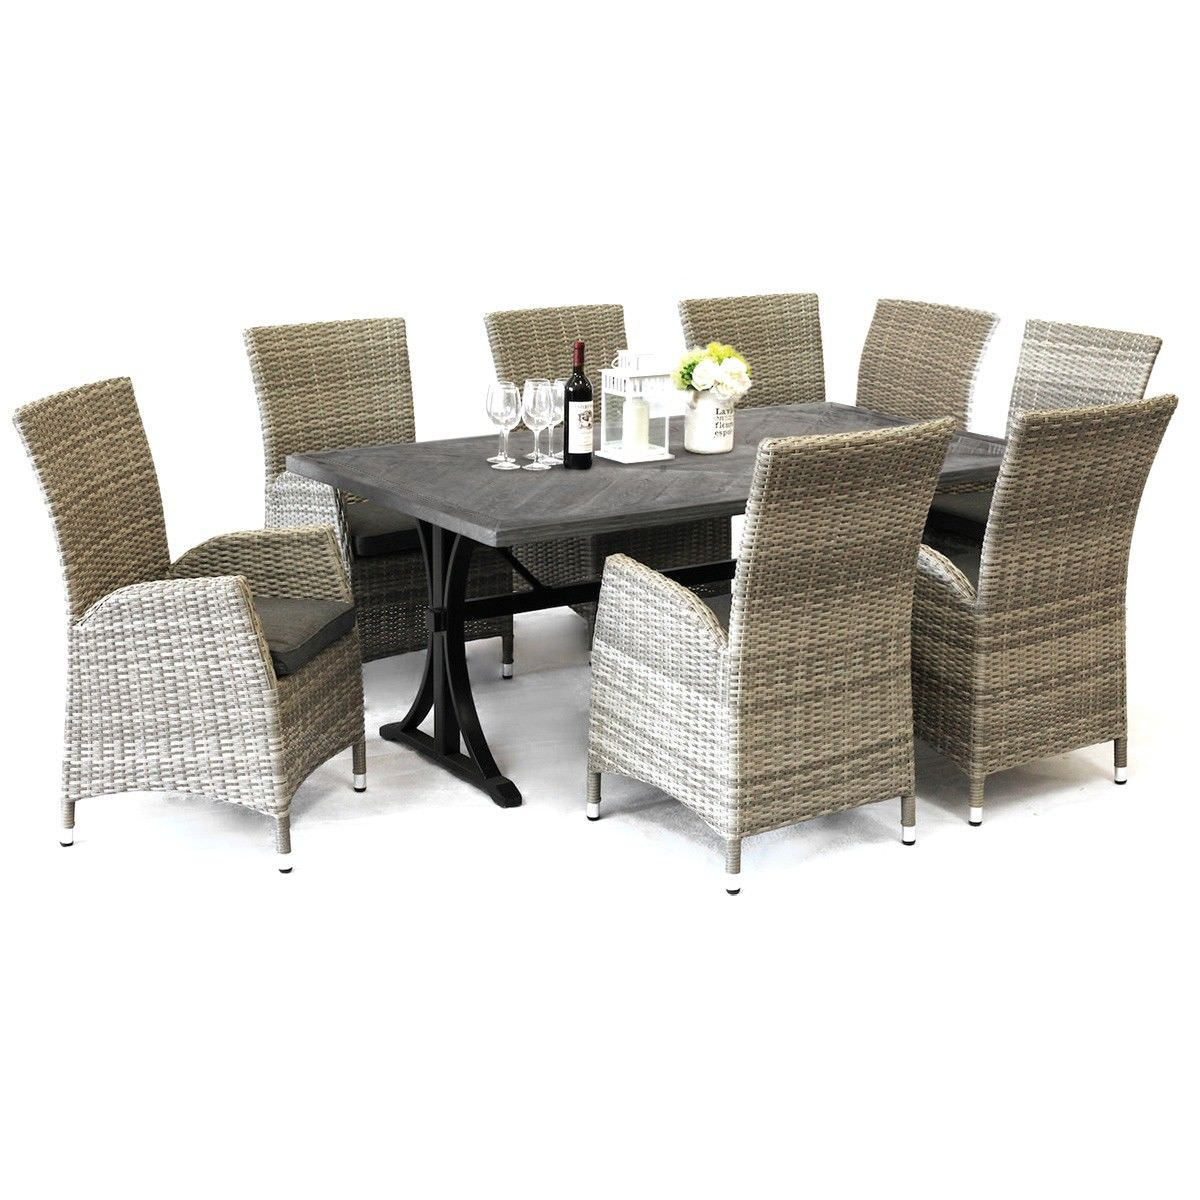 Sorrento 9 Piece Outdoor Dining Table Set, 220cm, Grey